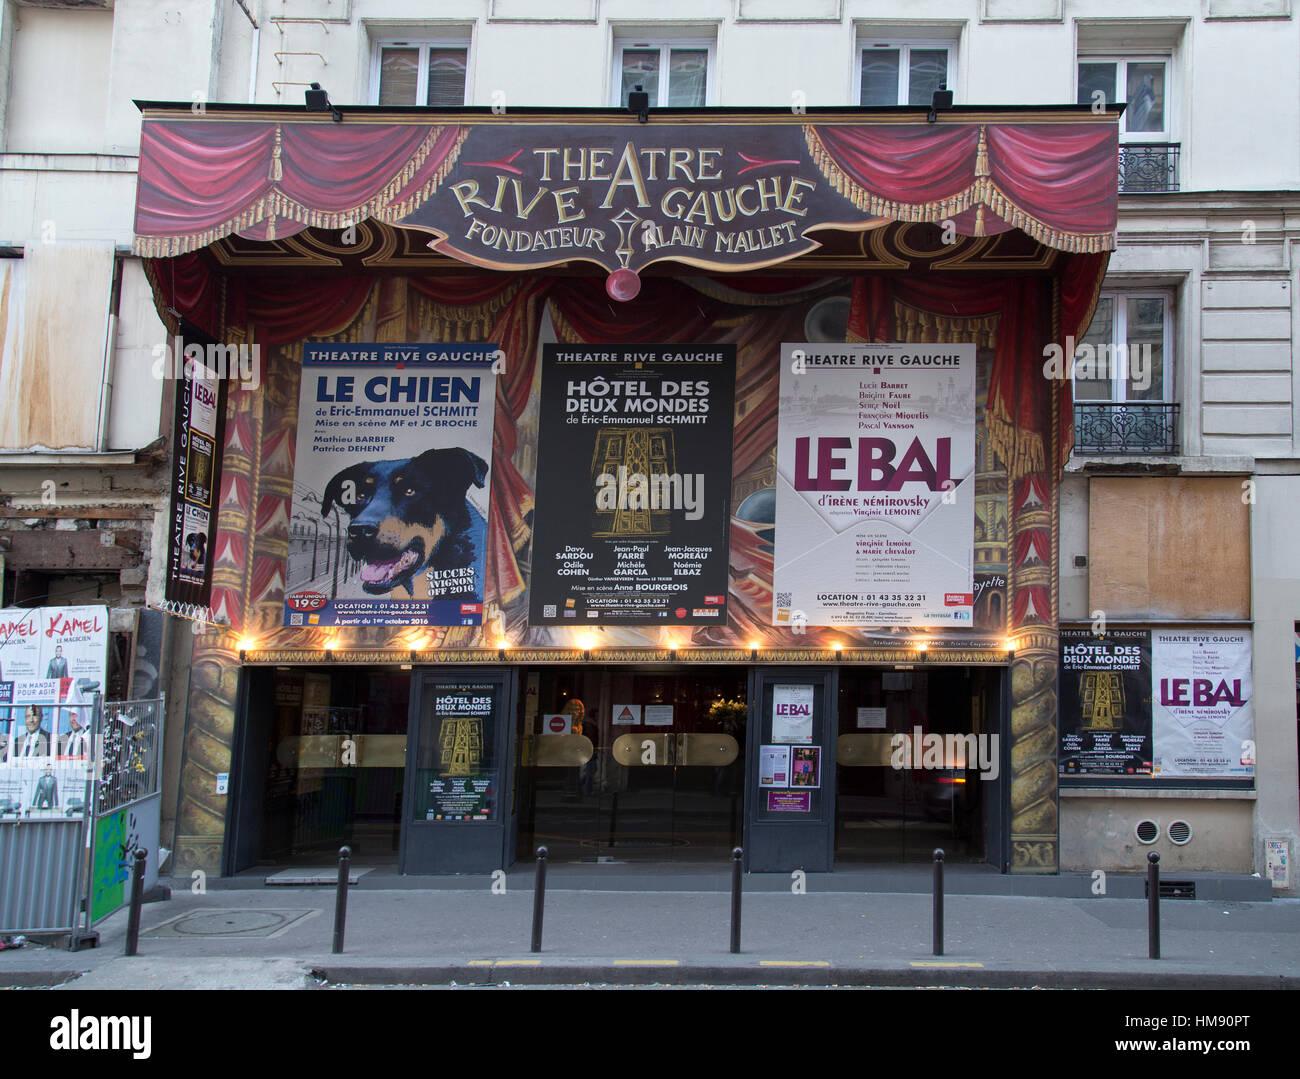 Exterior of the Theatre Rive Gauche in Montparnasse in the 14th arrondissement of Paris in winter - Stock Image